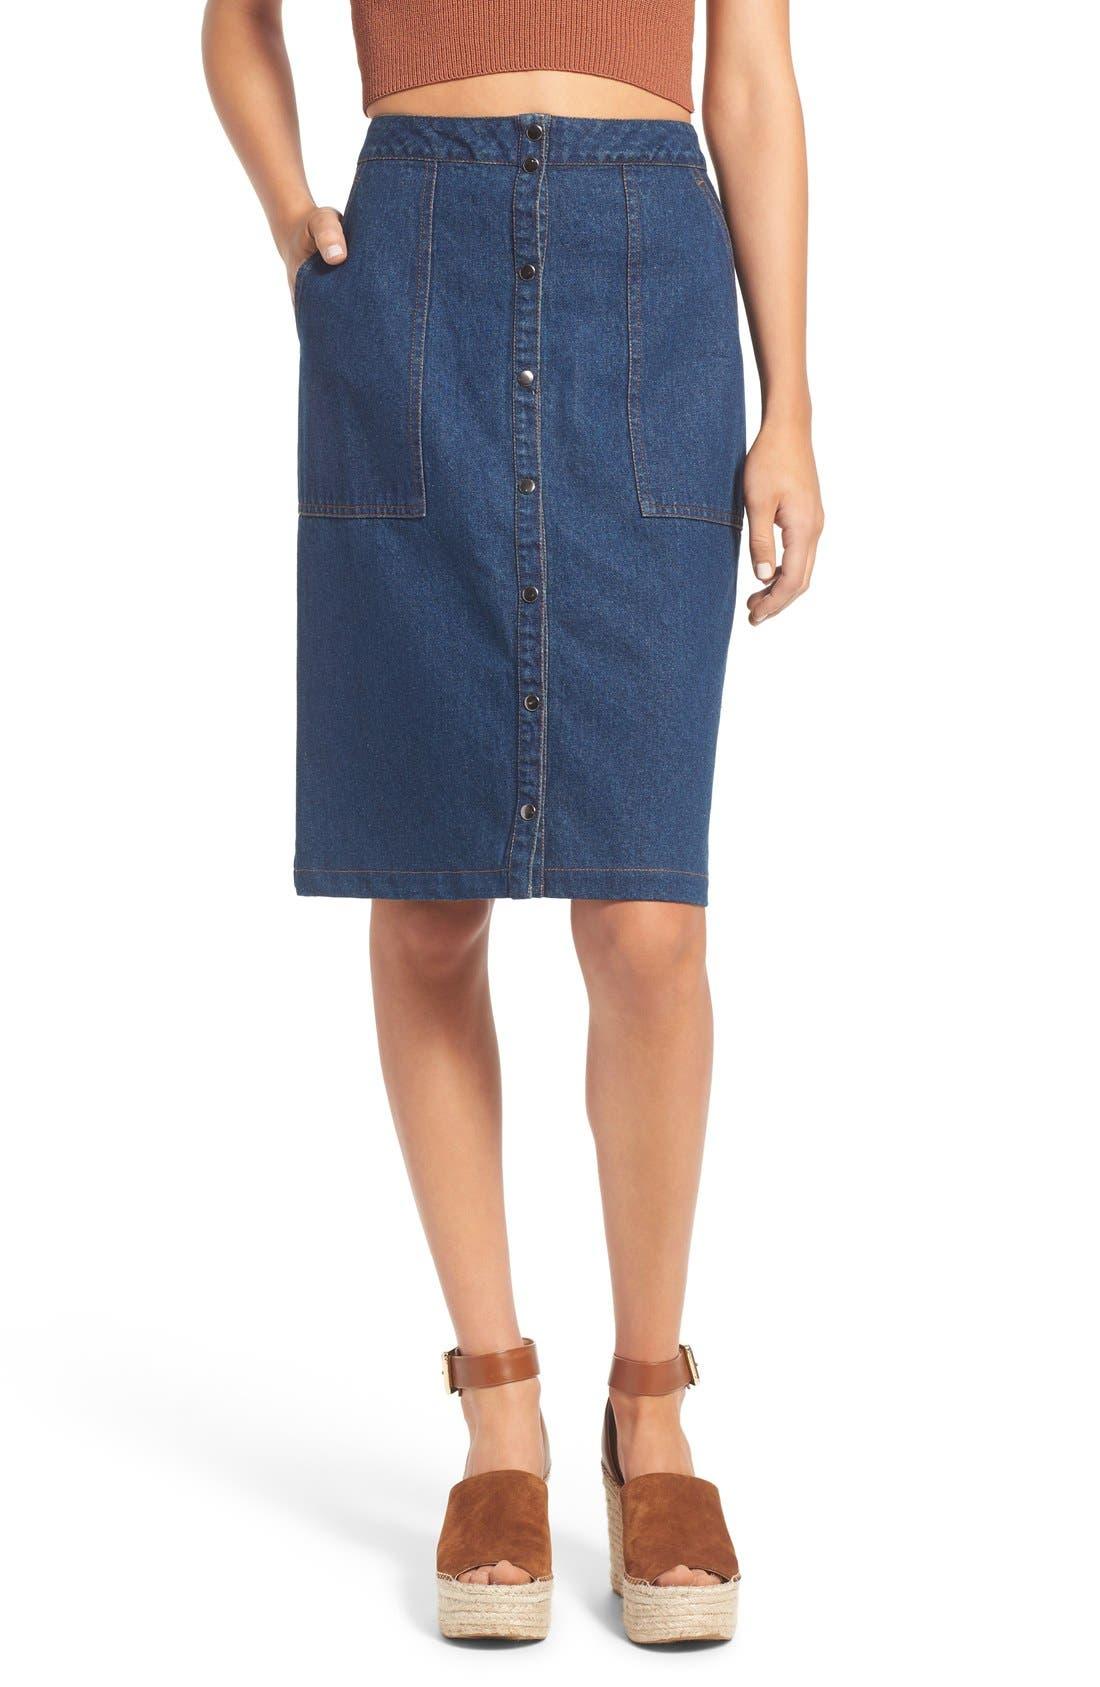 Main Image - ASTR 'Francisca' Button Front Denim Skirt